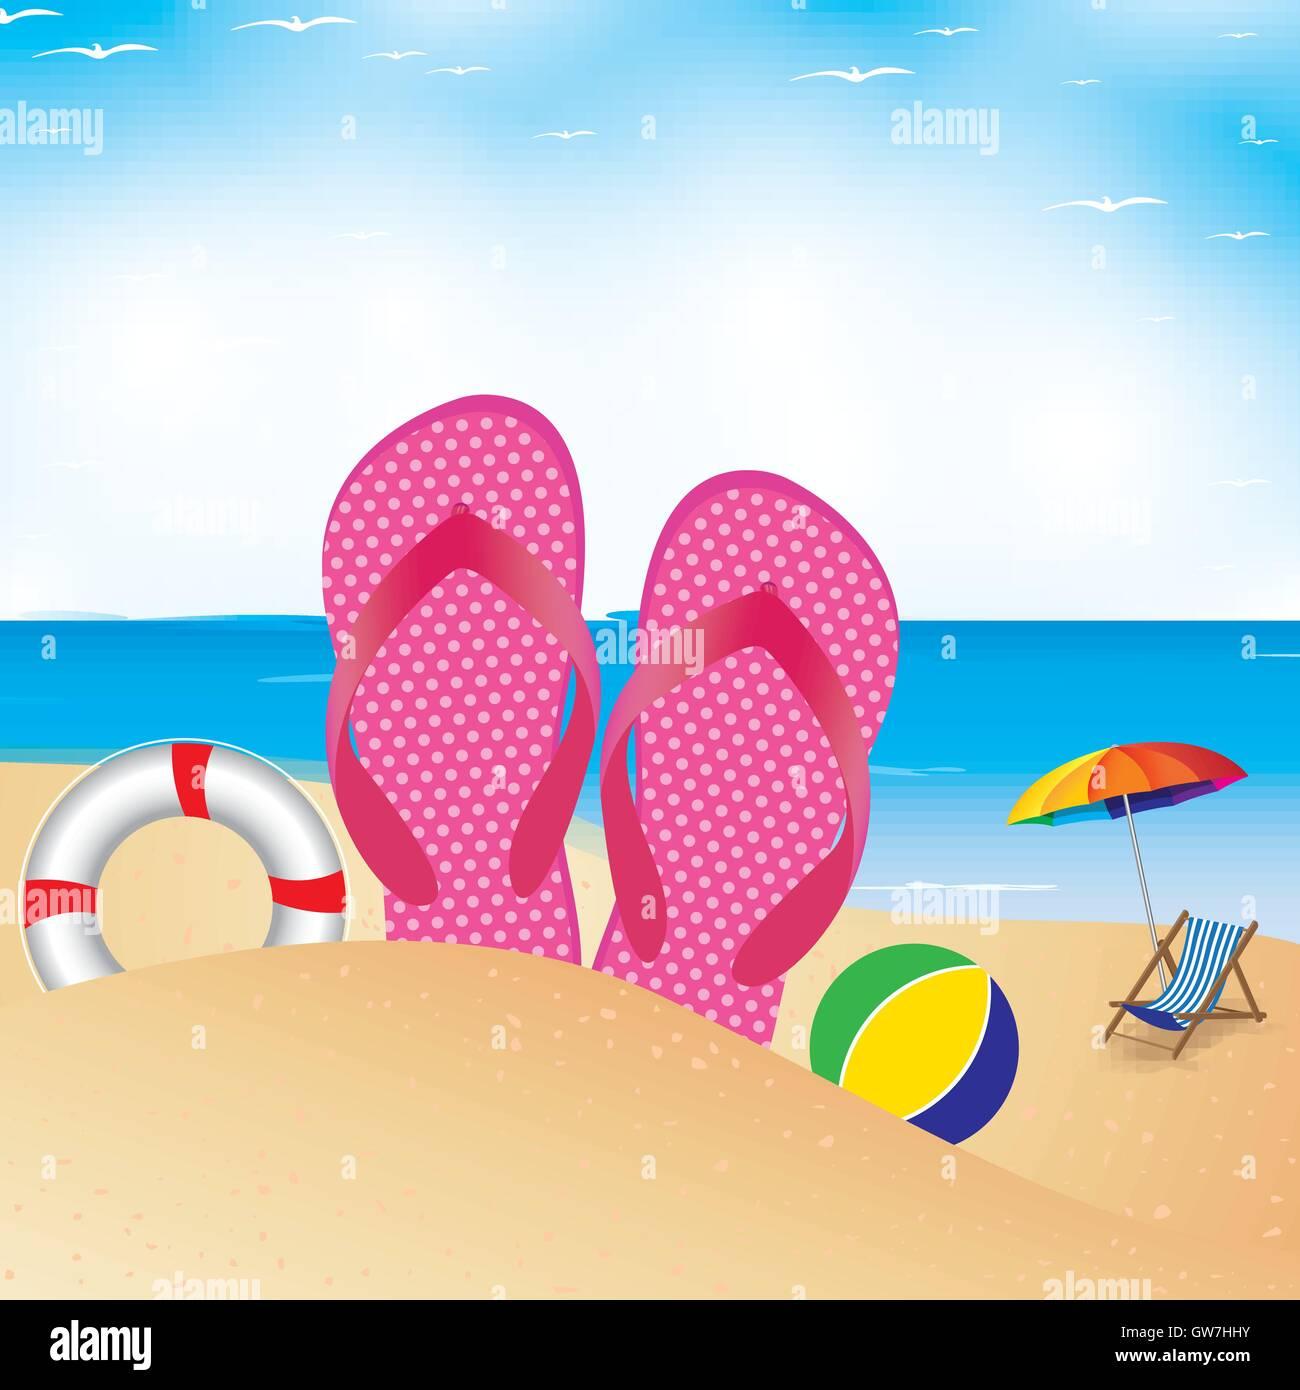 Beach Chair Vector Illustration Summer Umbrella Background Stock Vector Image Art Alamy